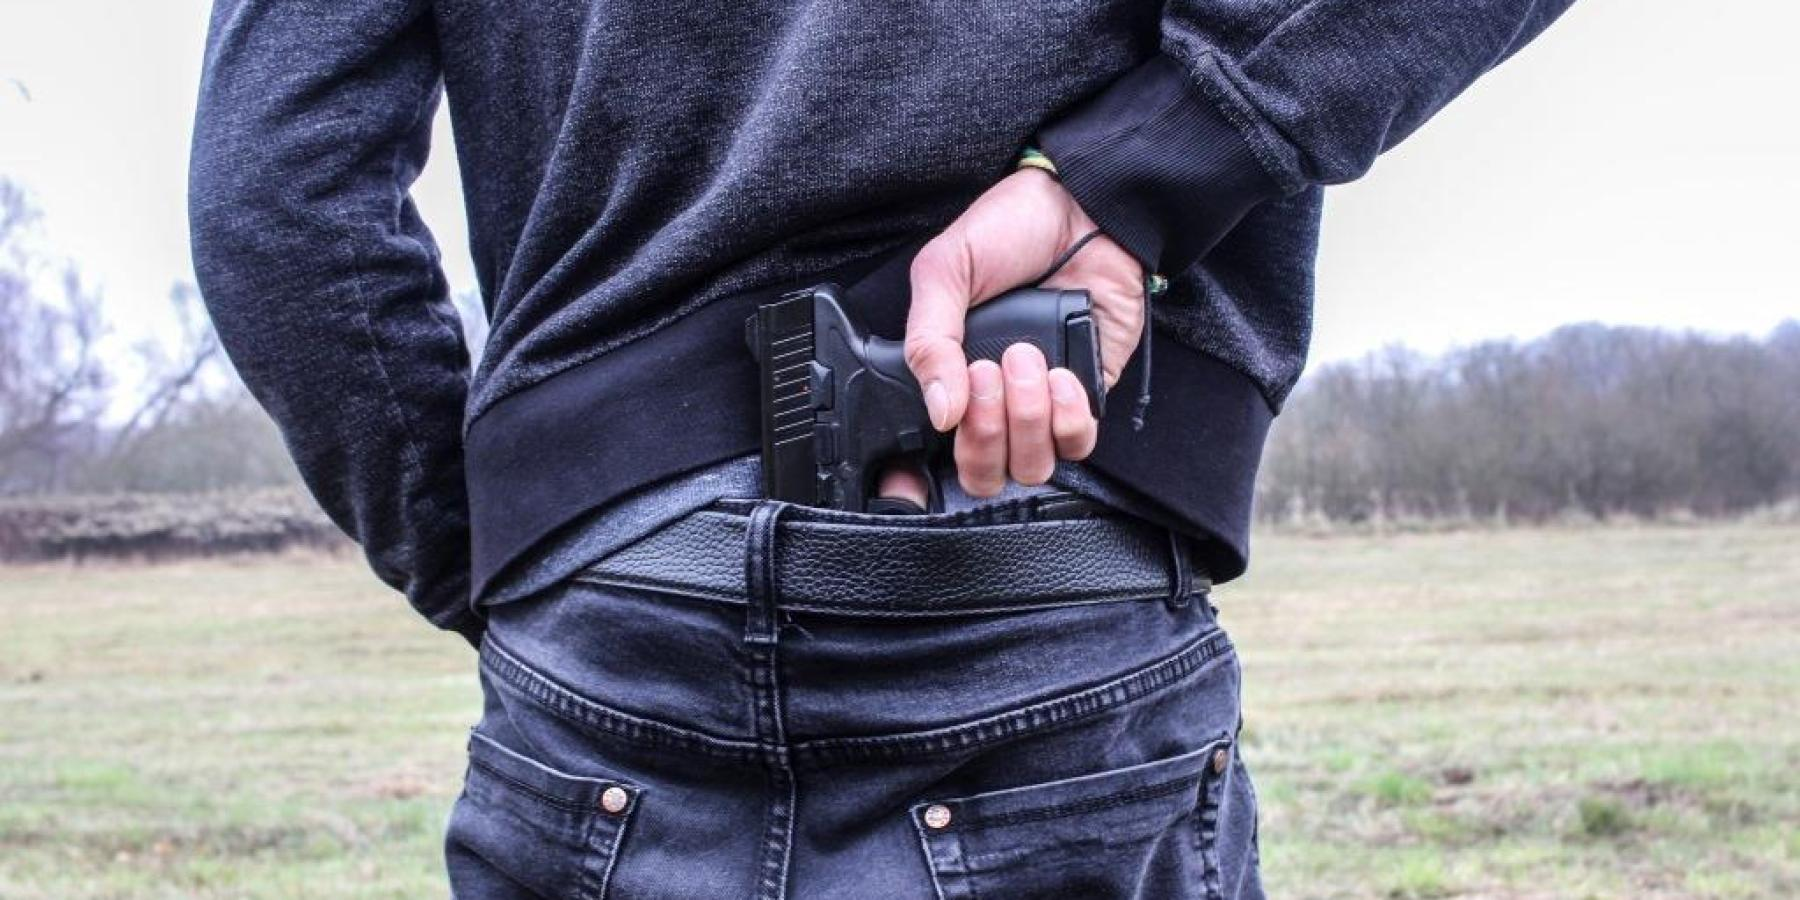 Polizist erschießt 37-jährigen Angreifer in Gelsenkirchen